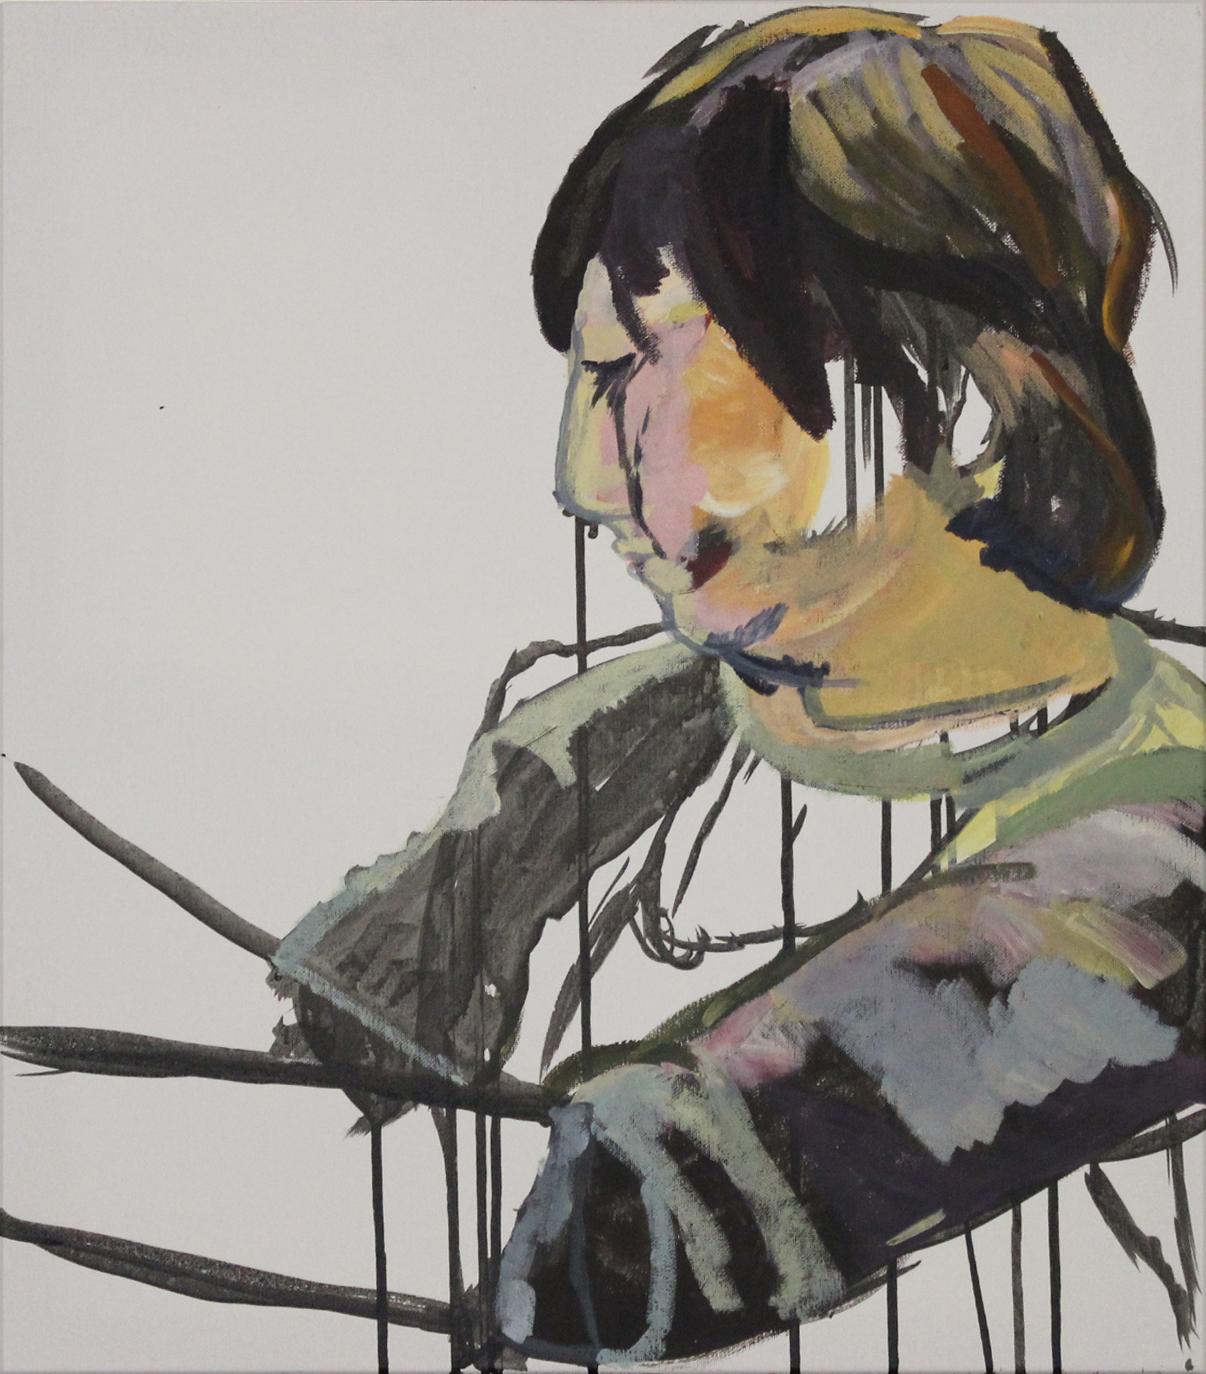 Harris' by Euan Stewart